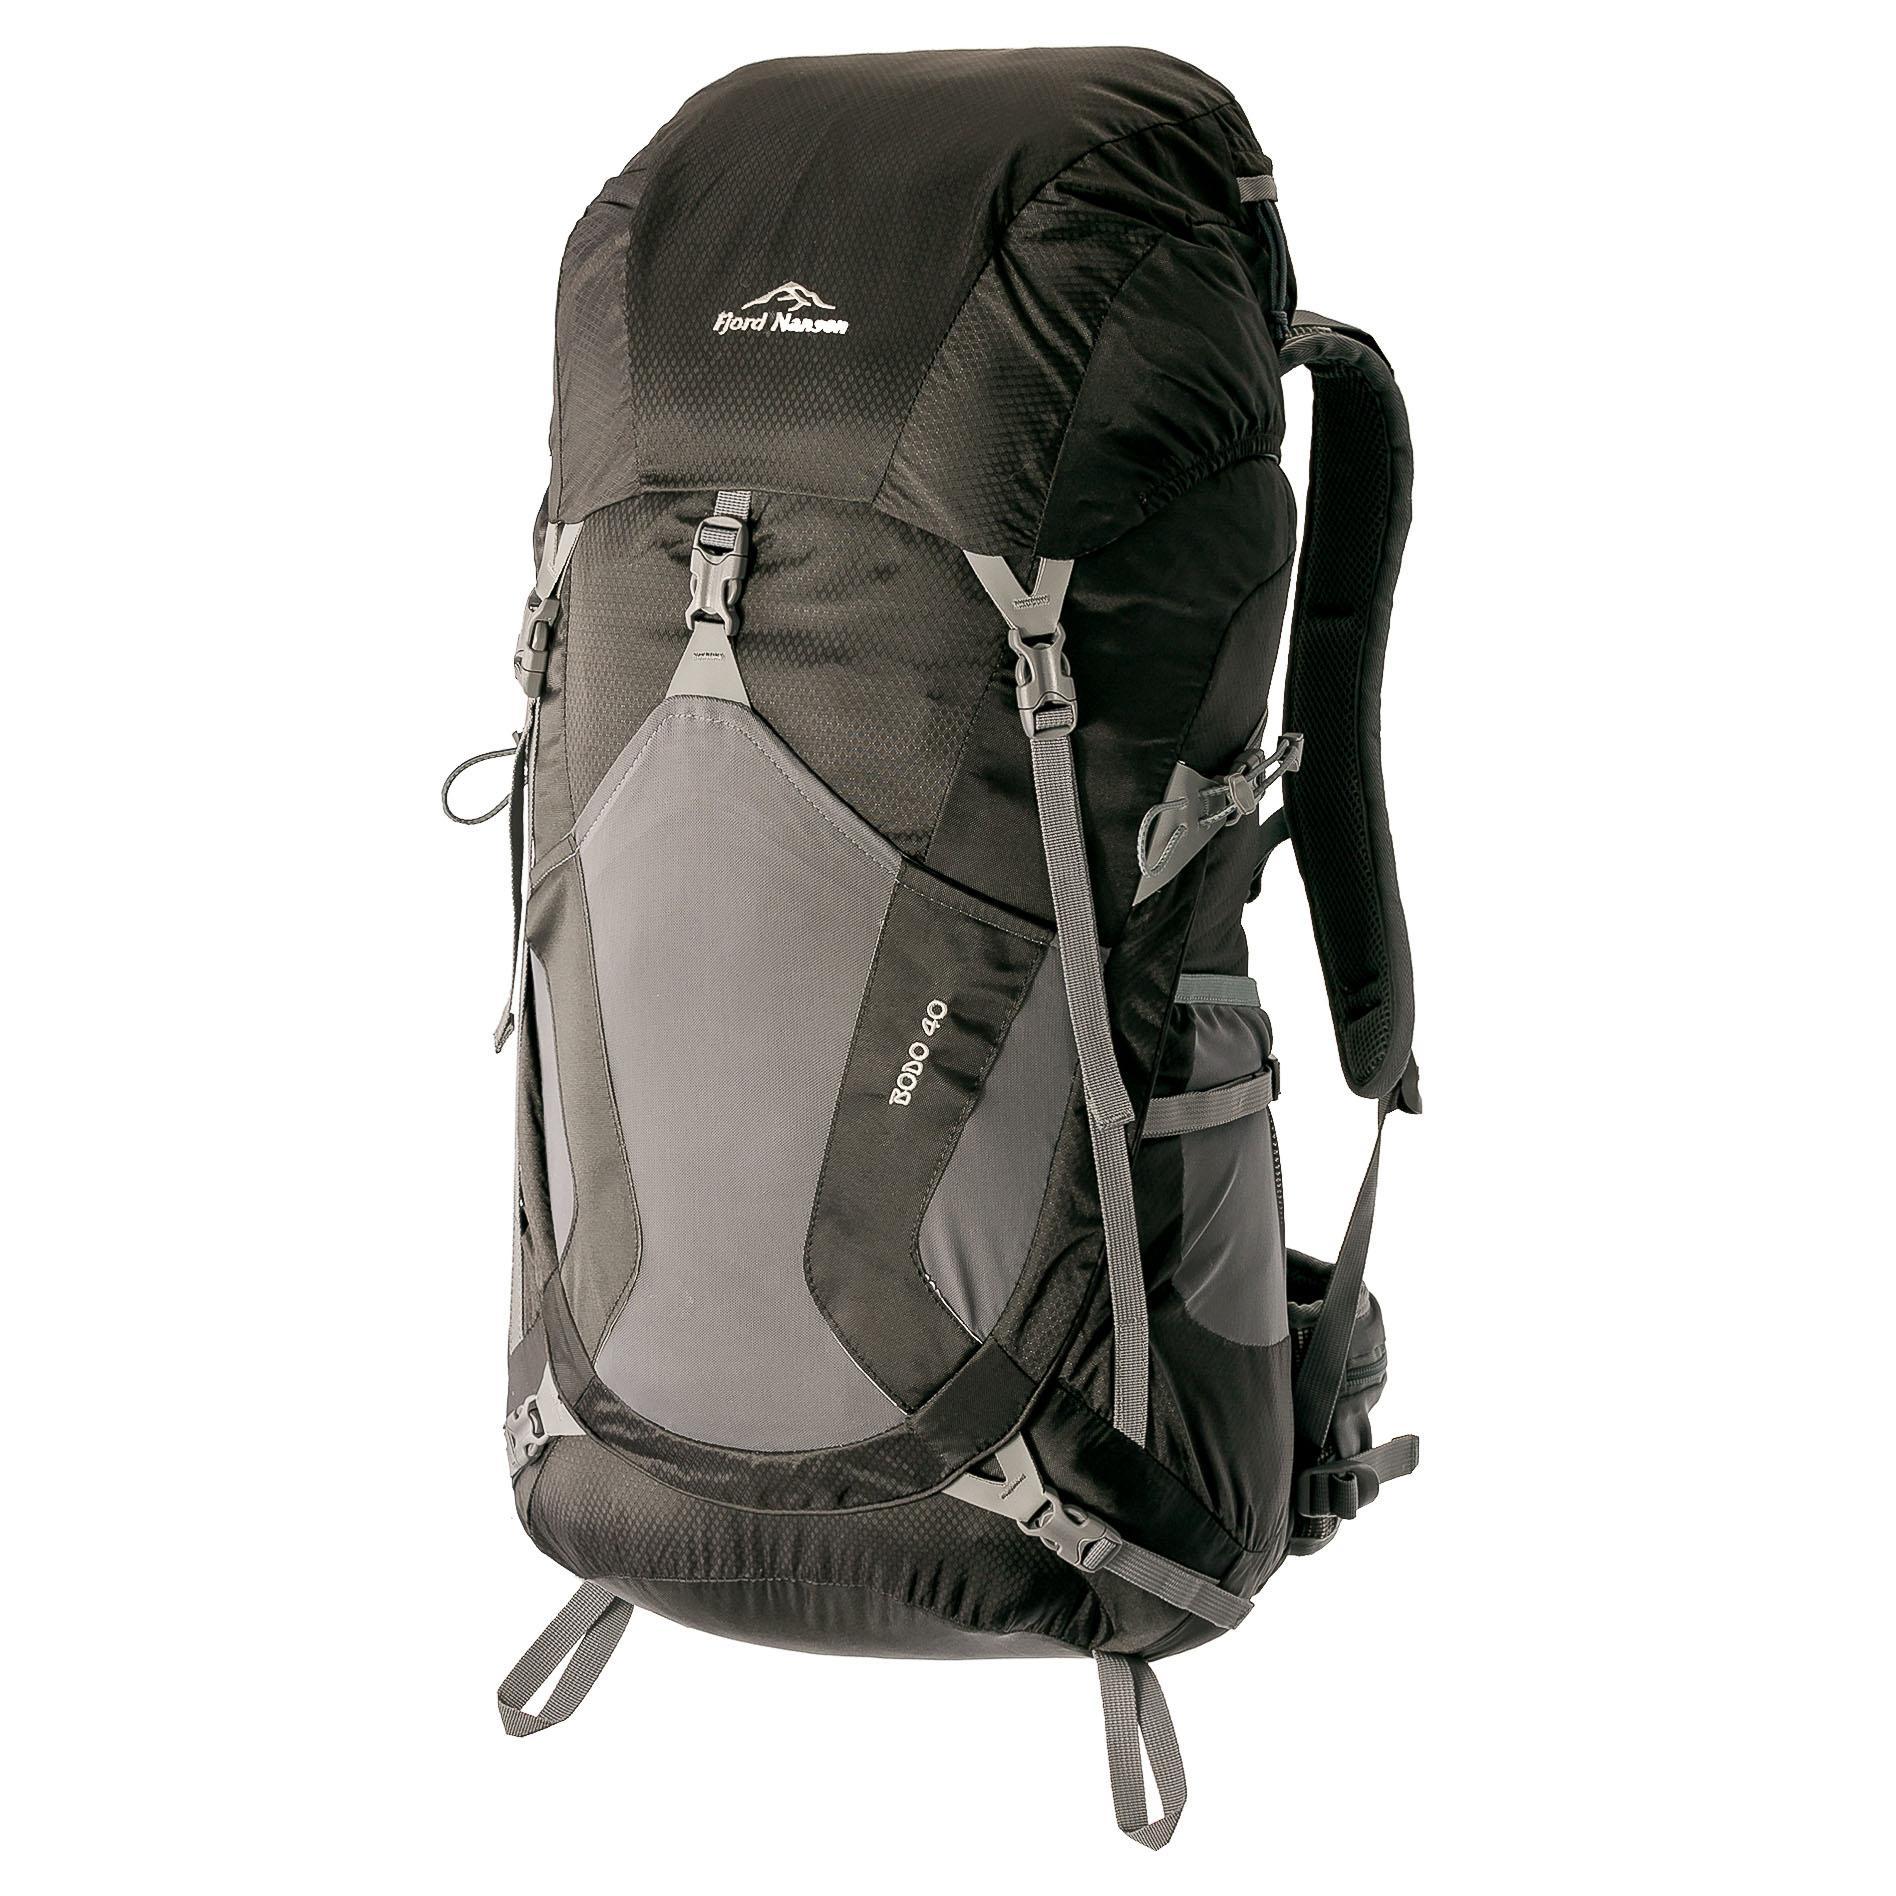 551058f32e Ορειβατικά σακίδια πλάτης Fjord Nansen Bodo 40 black plecak ...